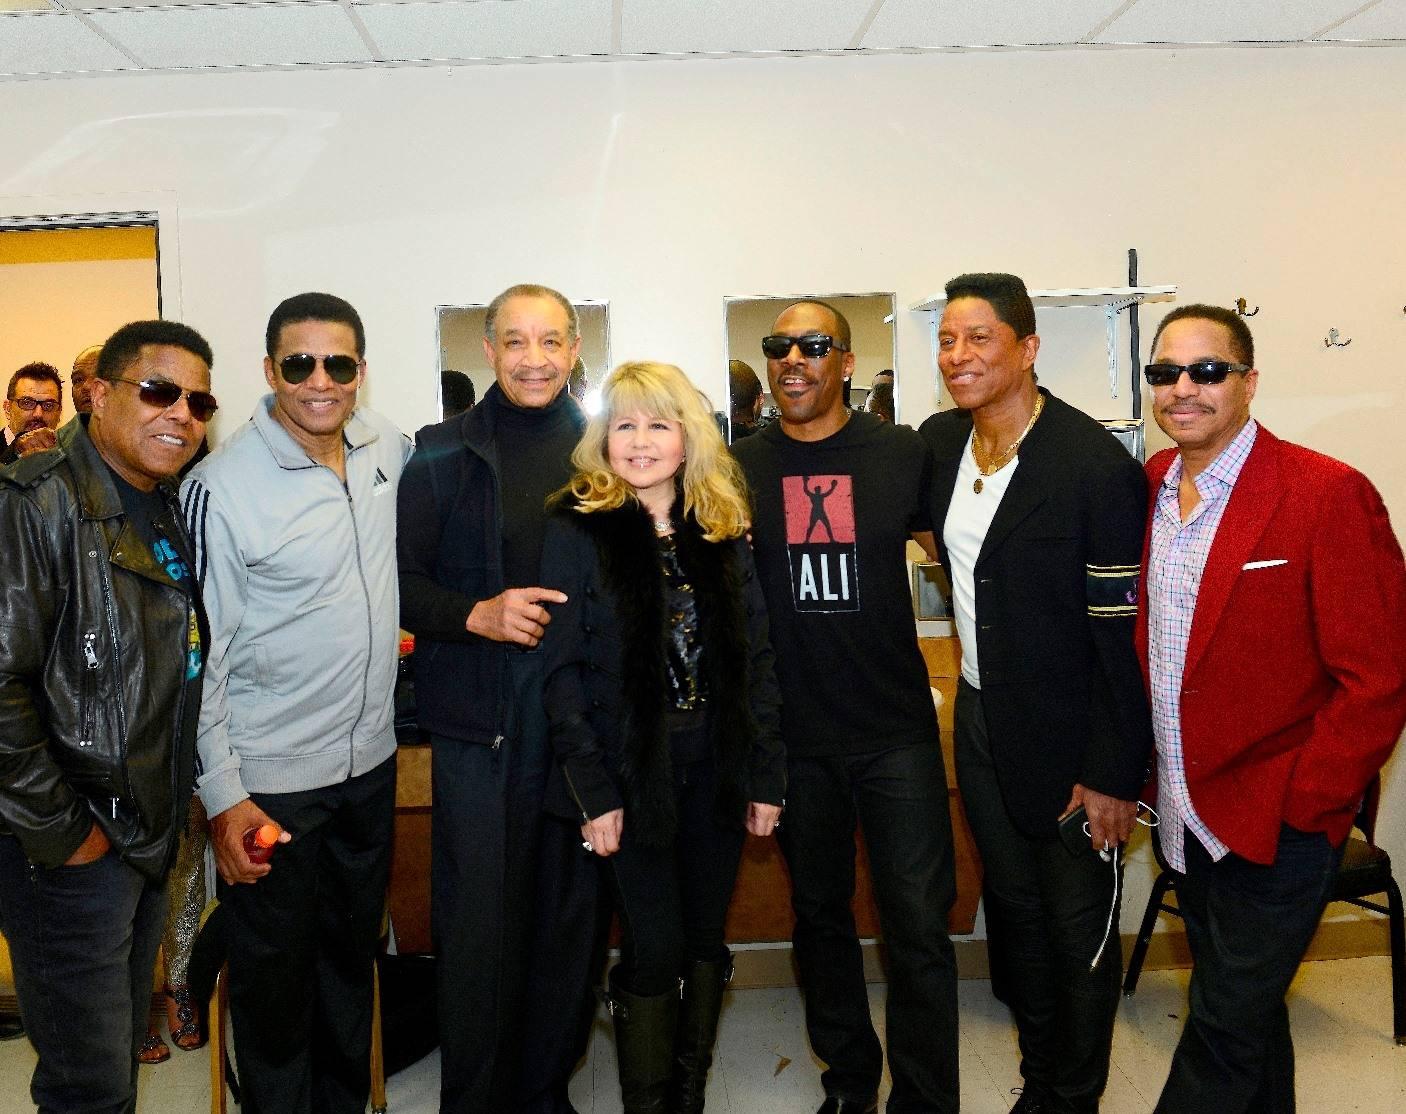 Tito, Jackie, Lamont McLemore, Pia Zadora, Eddie Murphy, Jermaine and Marlon - Photo credit Claude Van Heye